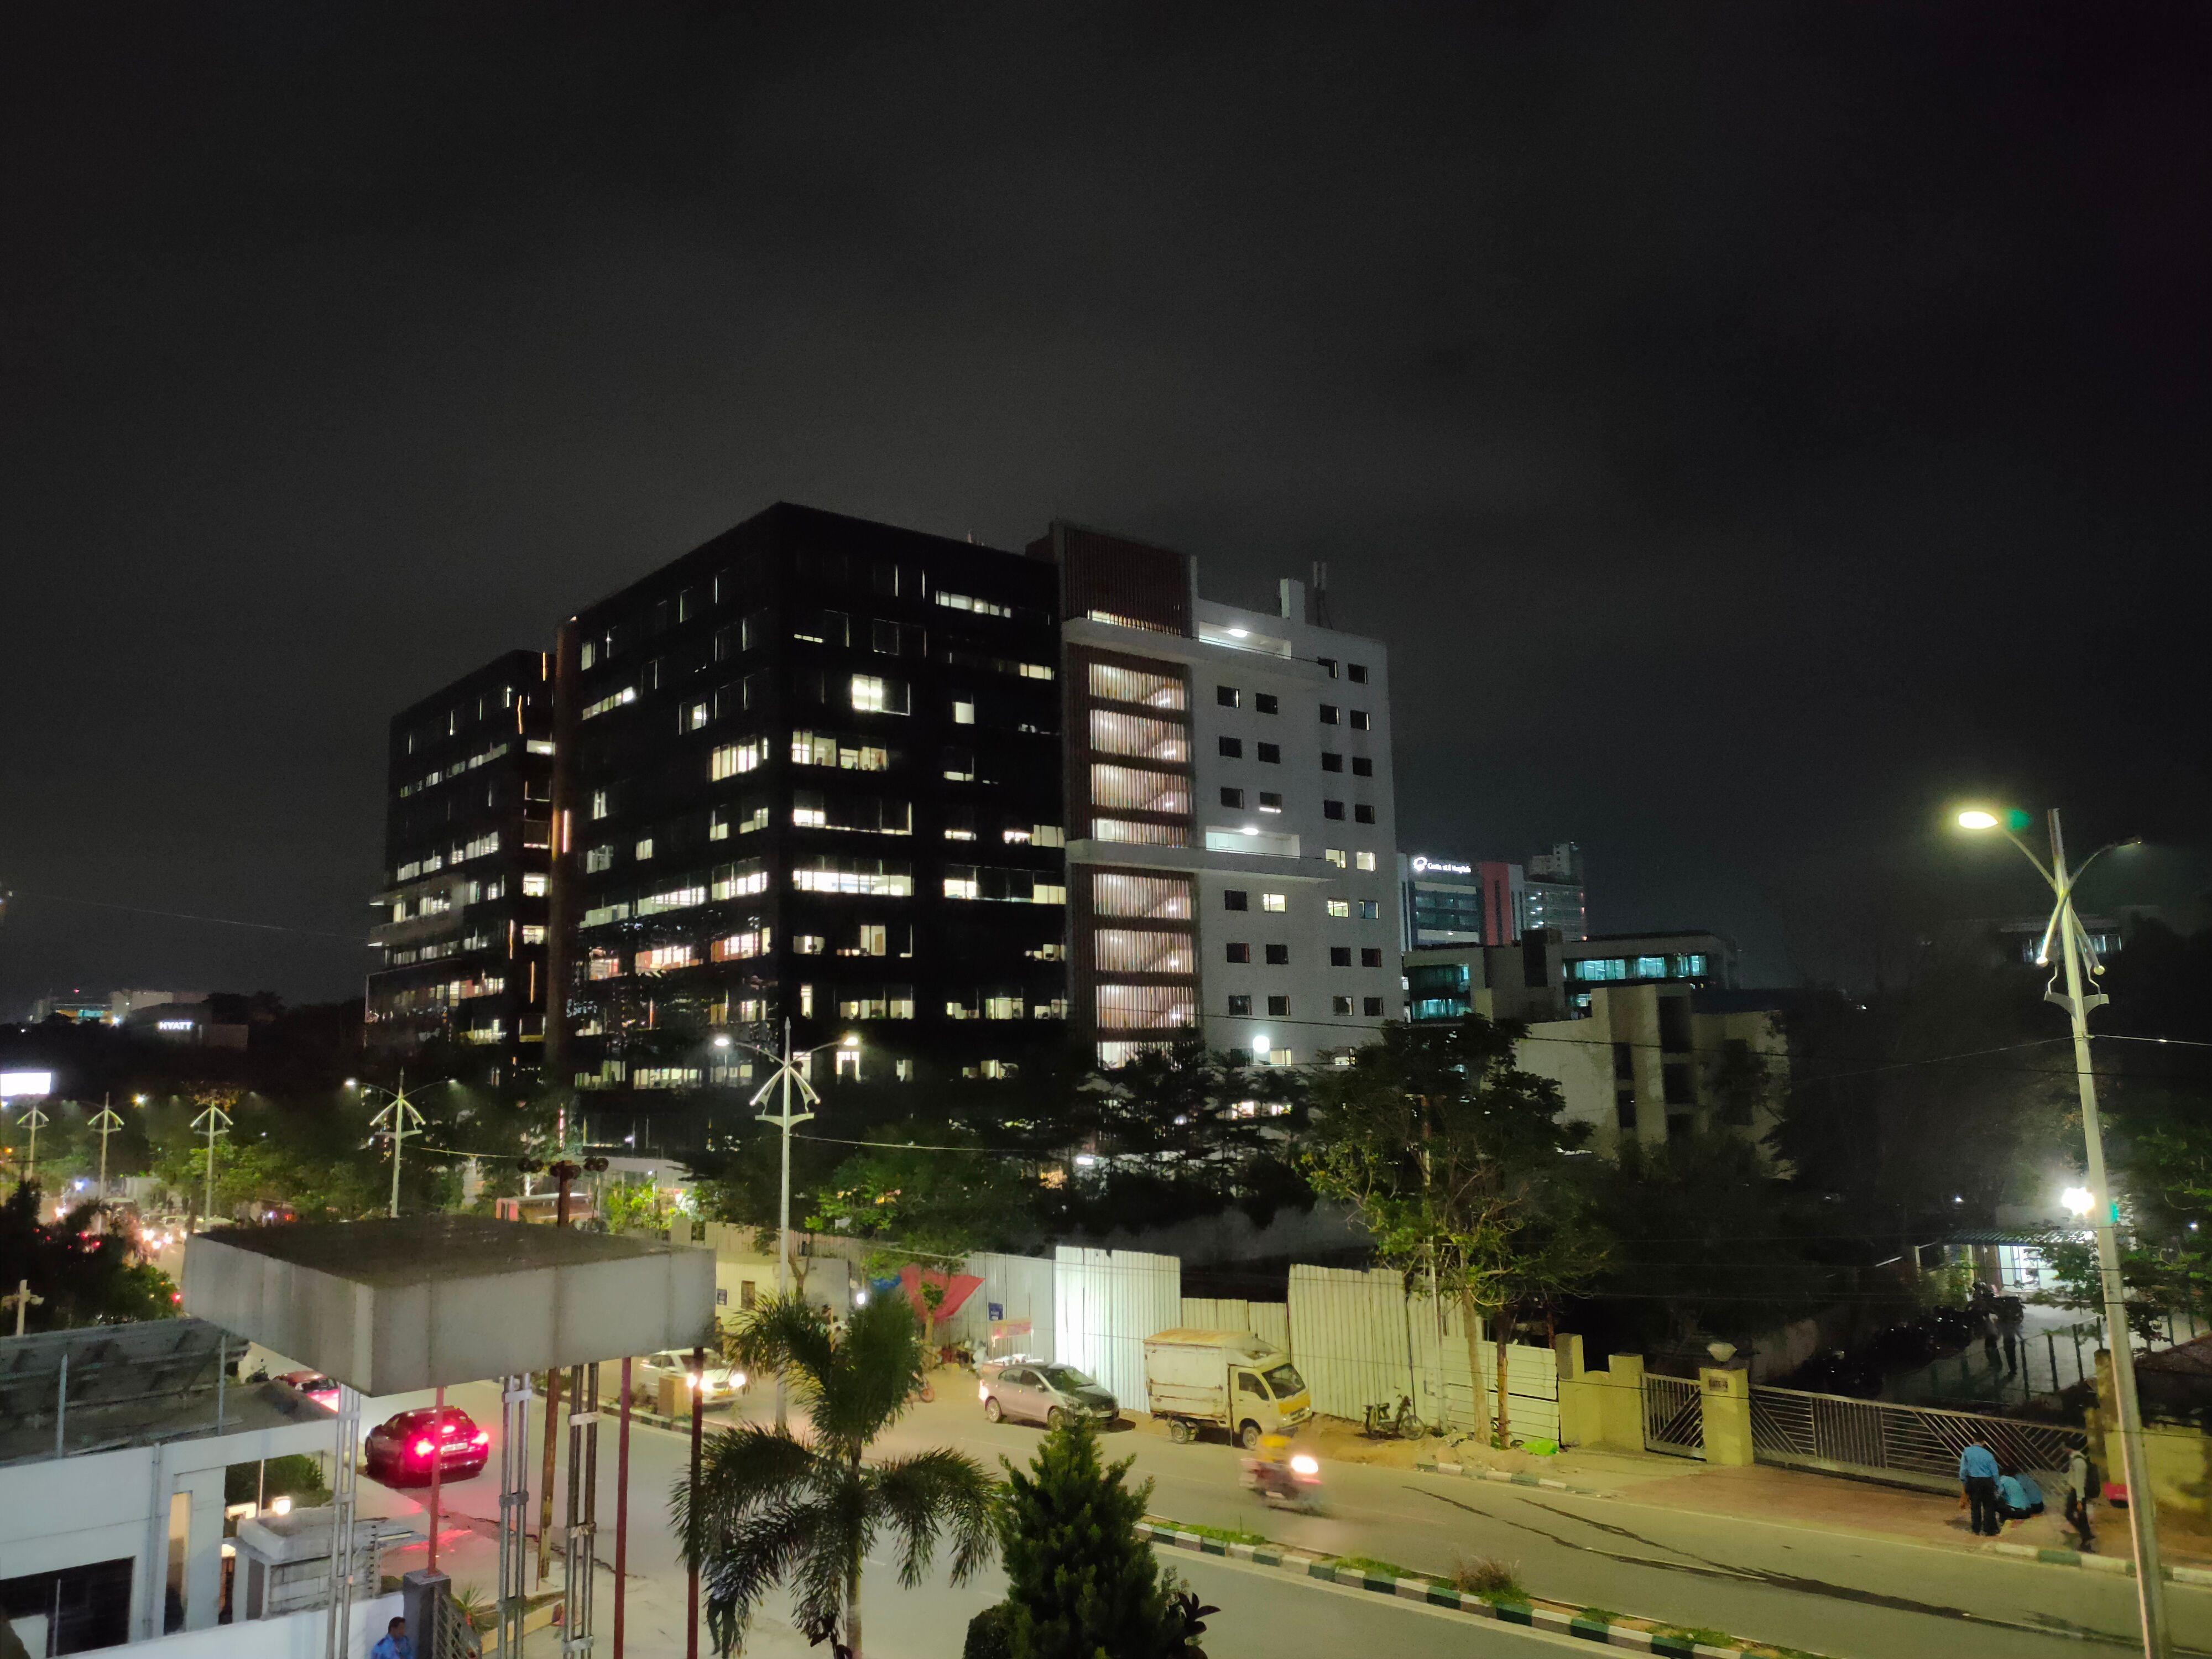 Realme X Camera Sample - Low Light Outdoor